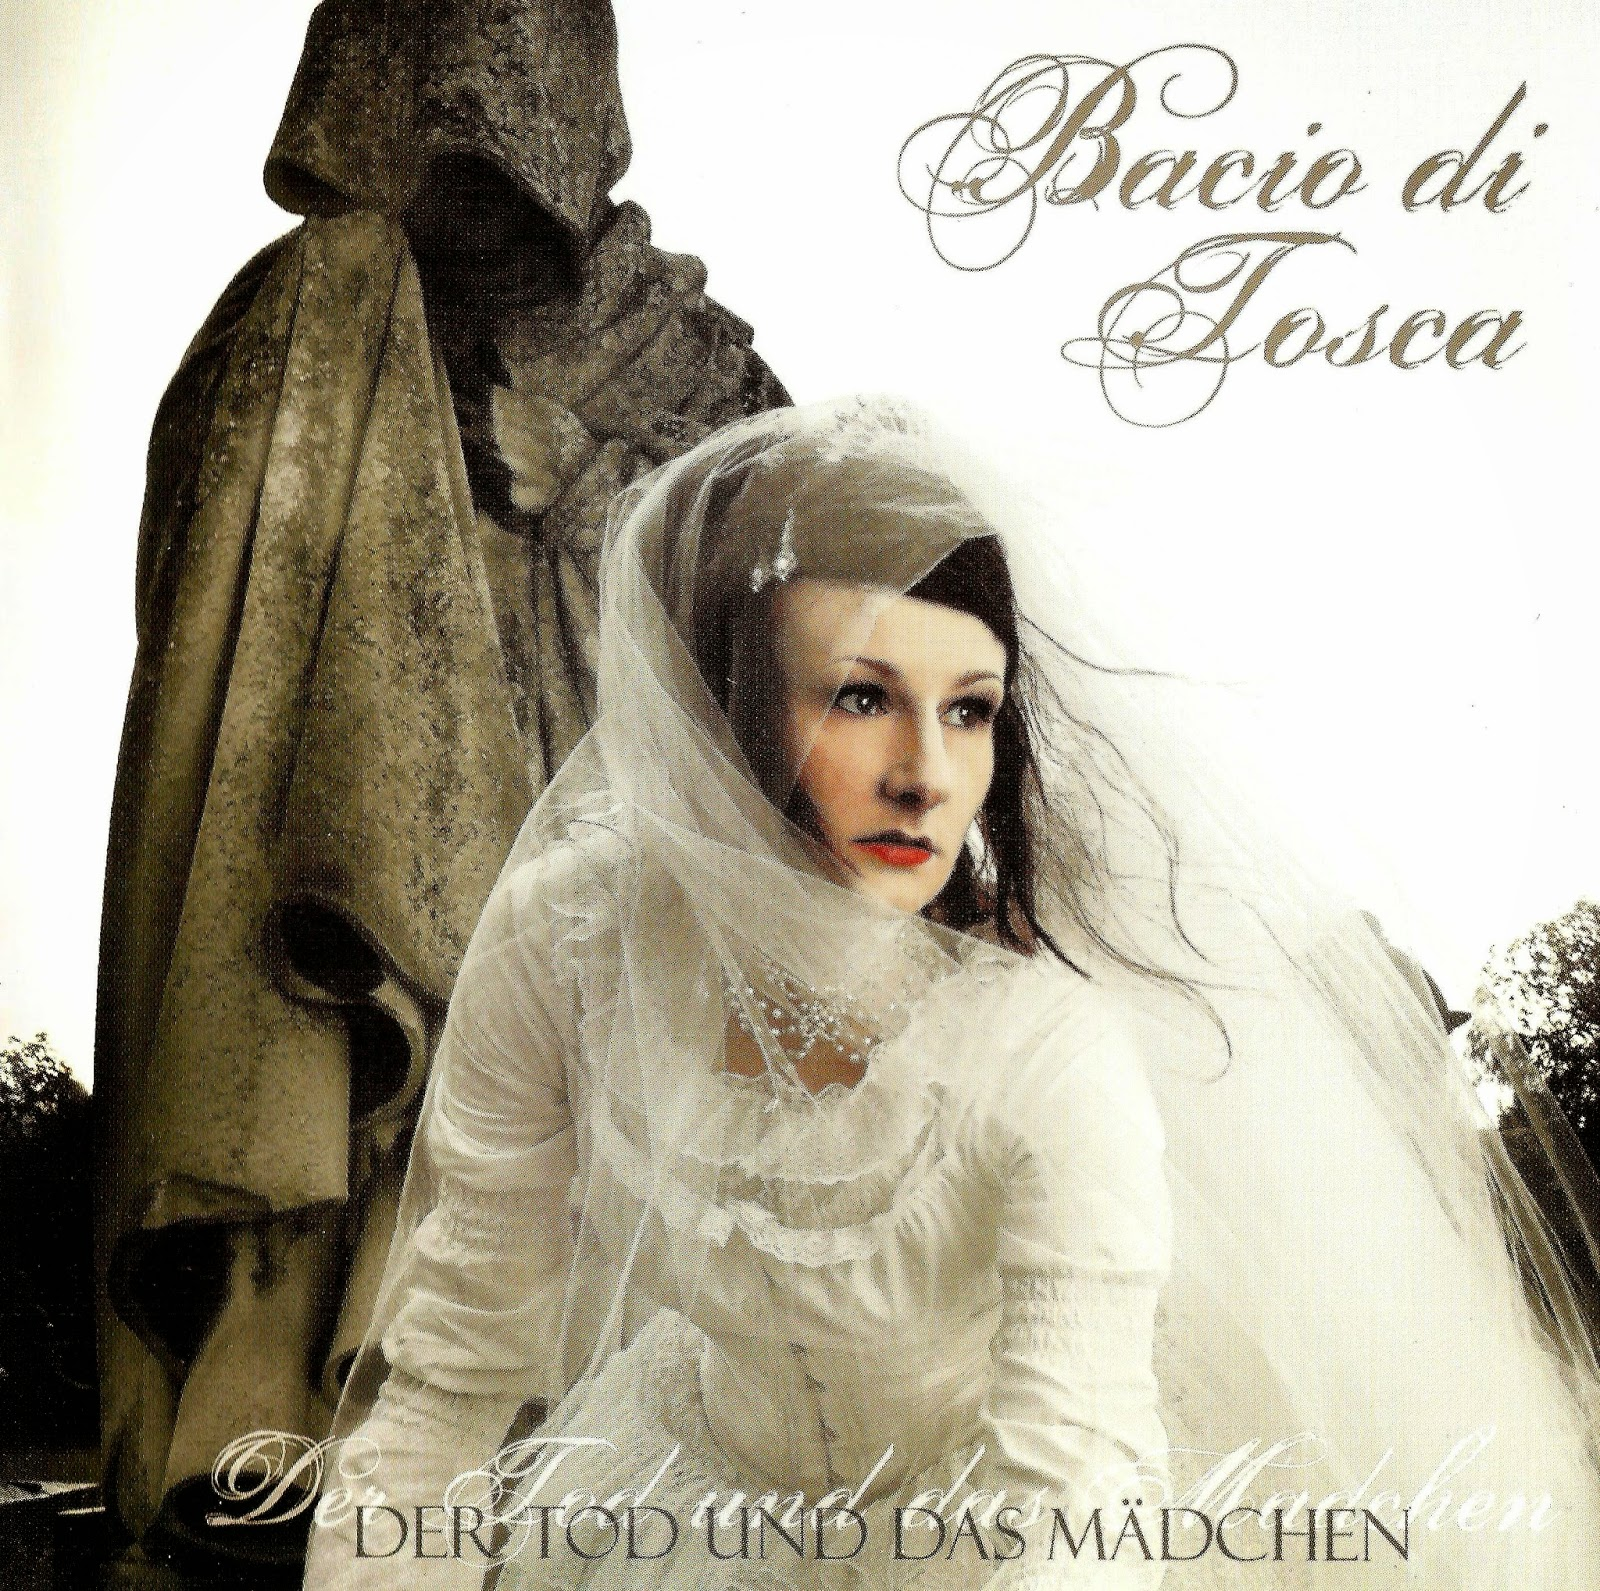 http://www.ulozto.net/xFTbkLZw/bacio-di-tosca-2007-der-tod-und-das-madchen-320kbps-rar